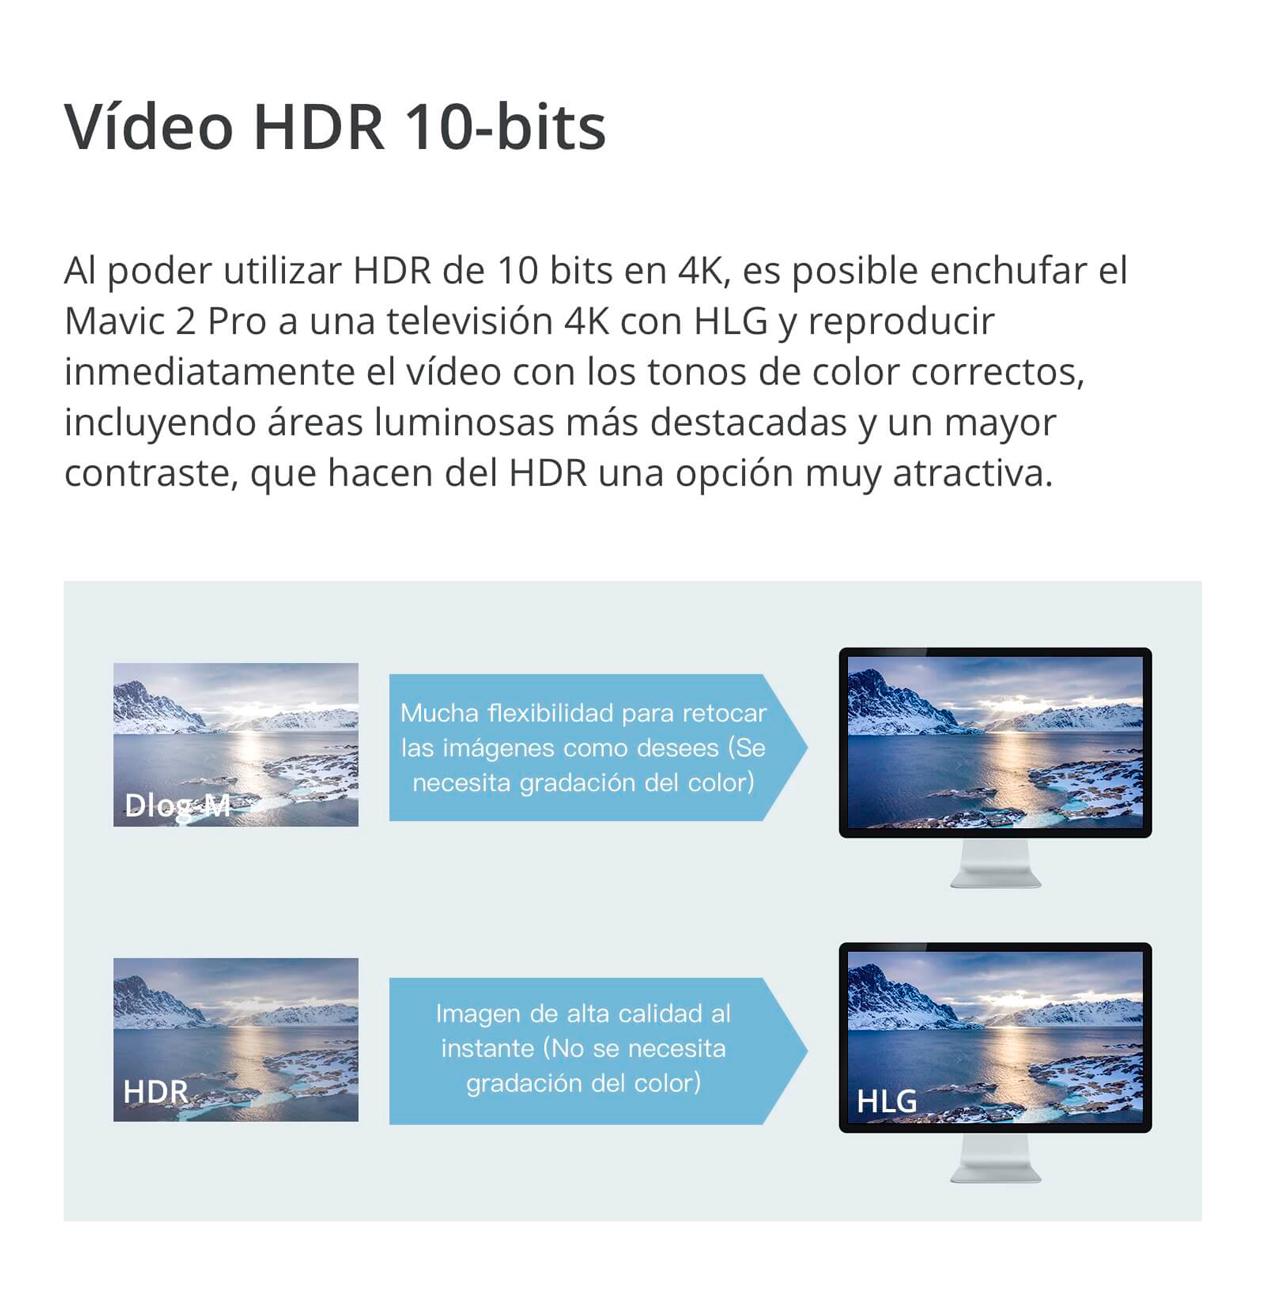 DJI MAVIC 2 PRO - VÍDEO HDR 10 BITS